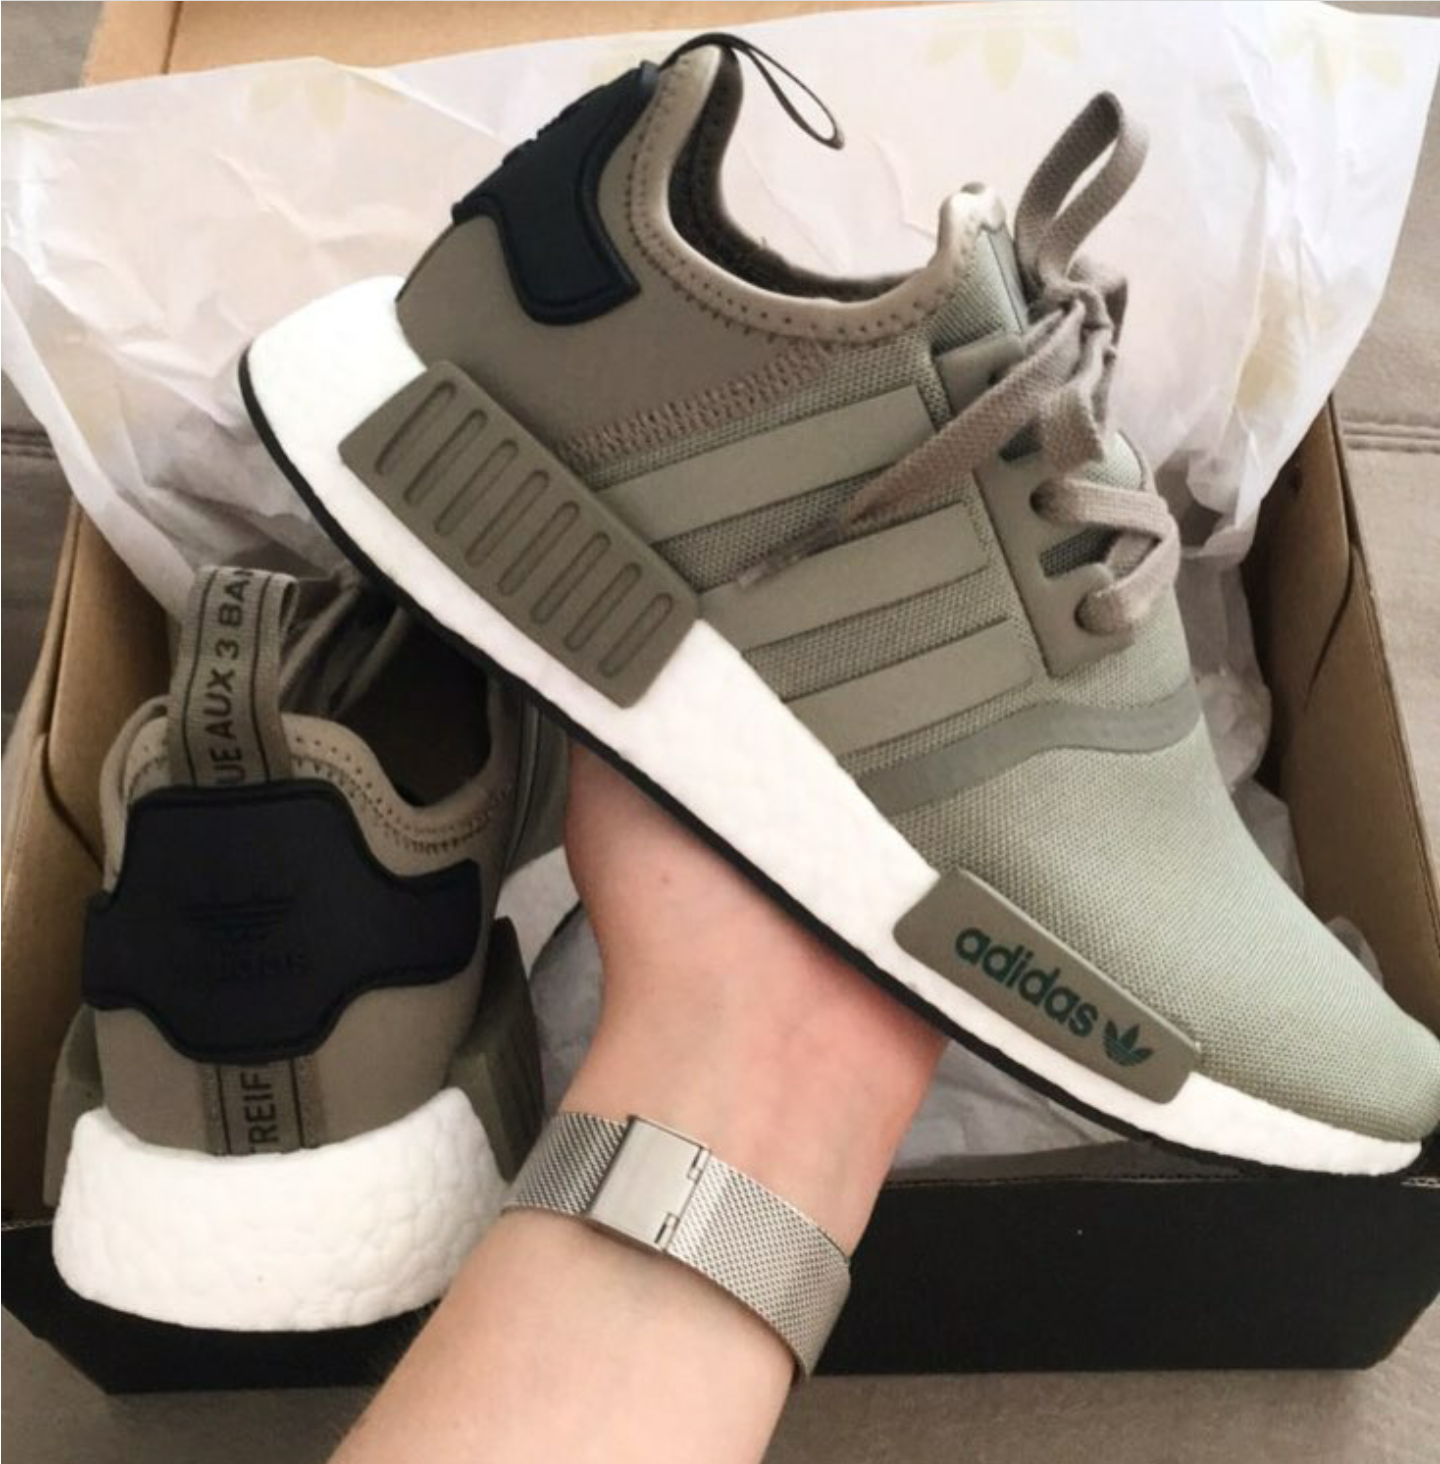 half off eb865 75f72 adidas Originals NMD R1 grün schwarz green balck Foto laura.x Instagram